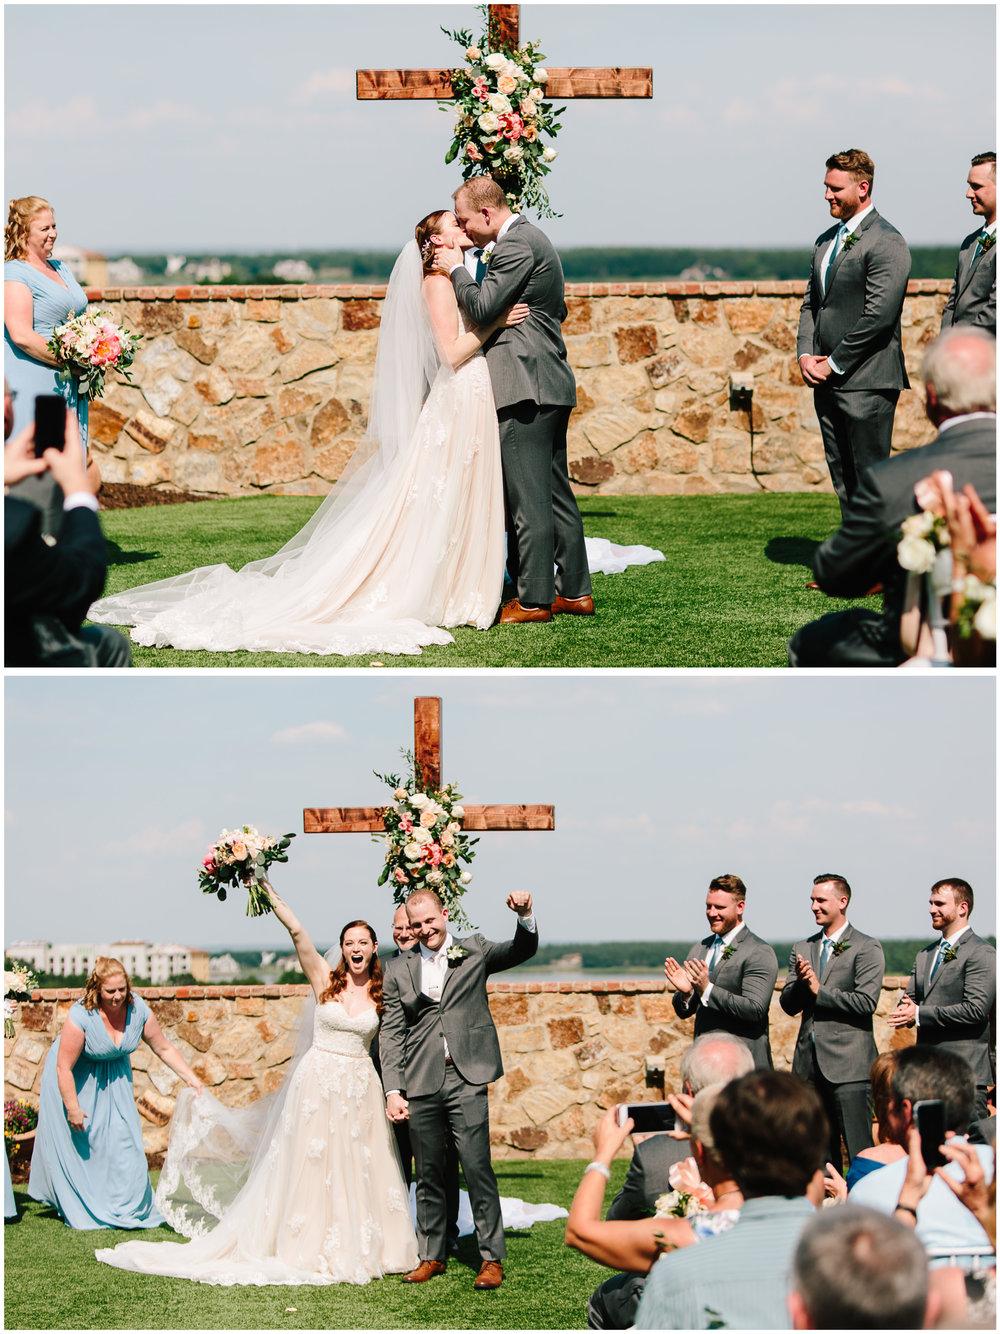 bella_collina_wedding_44.jpg